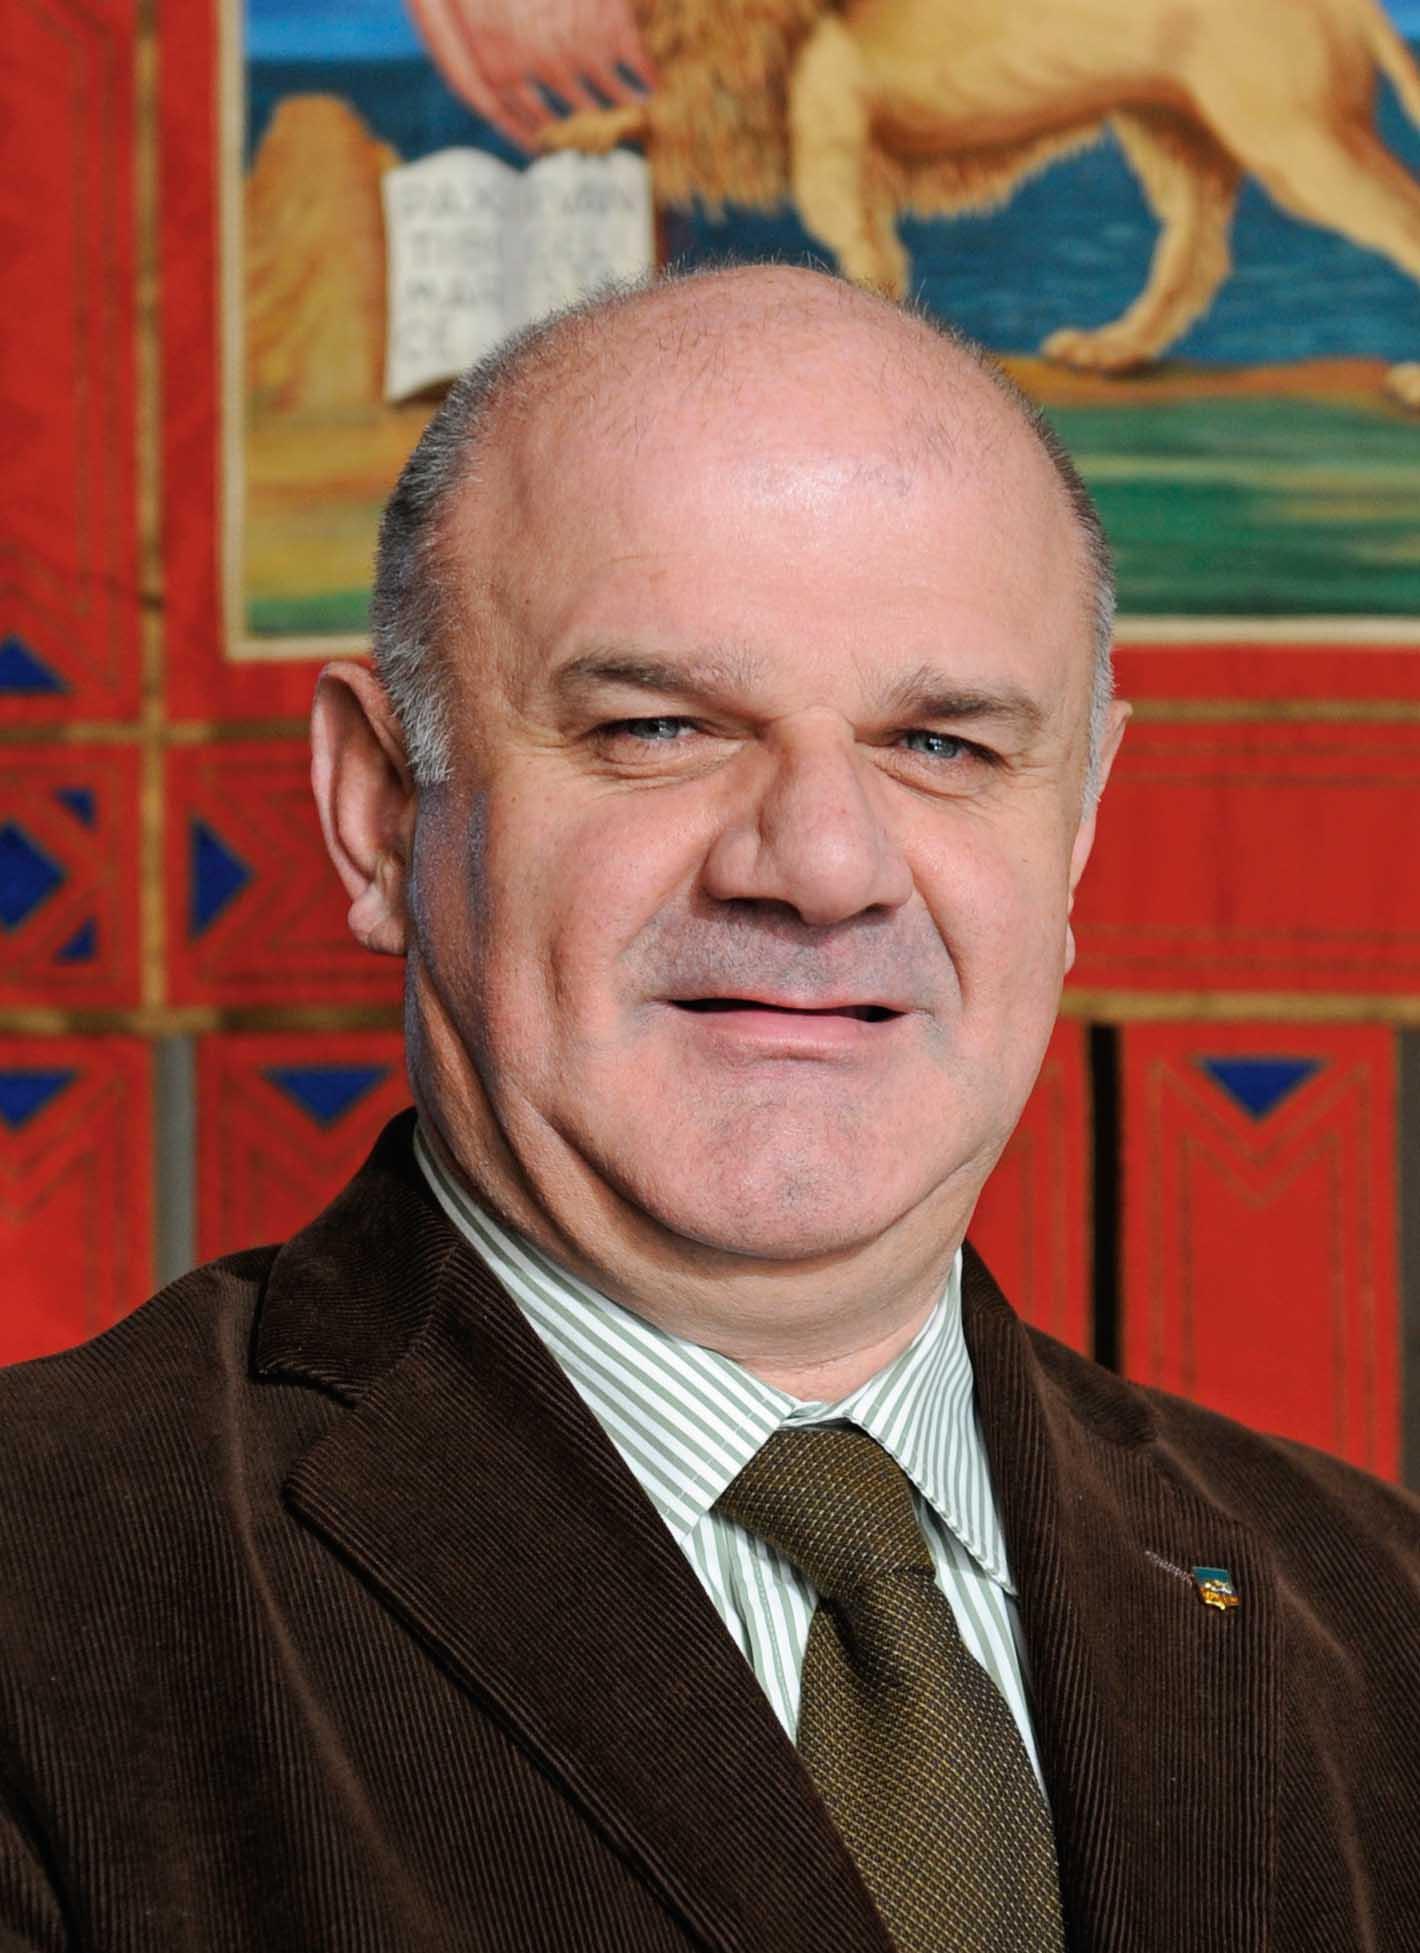 Daniele Stival